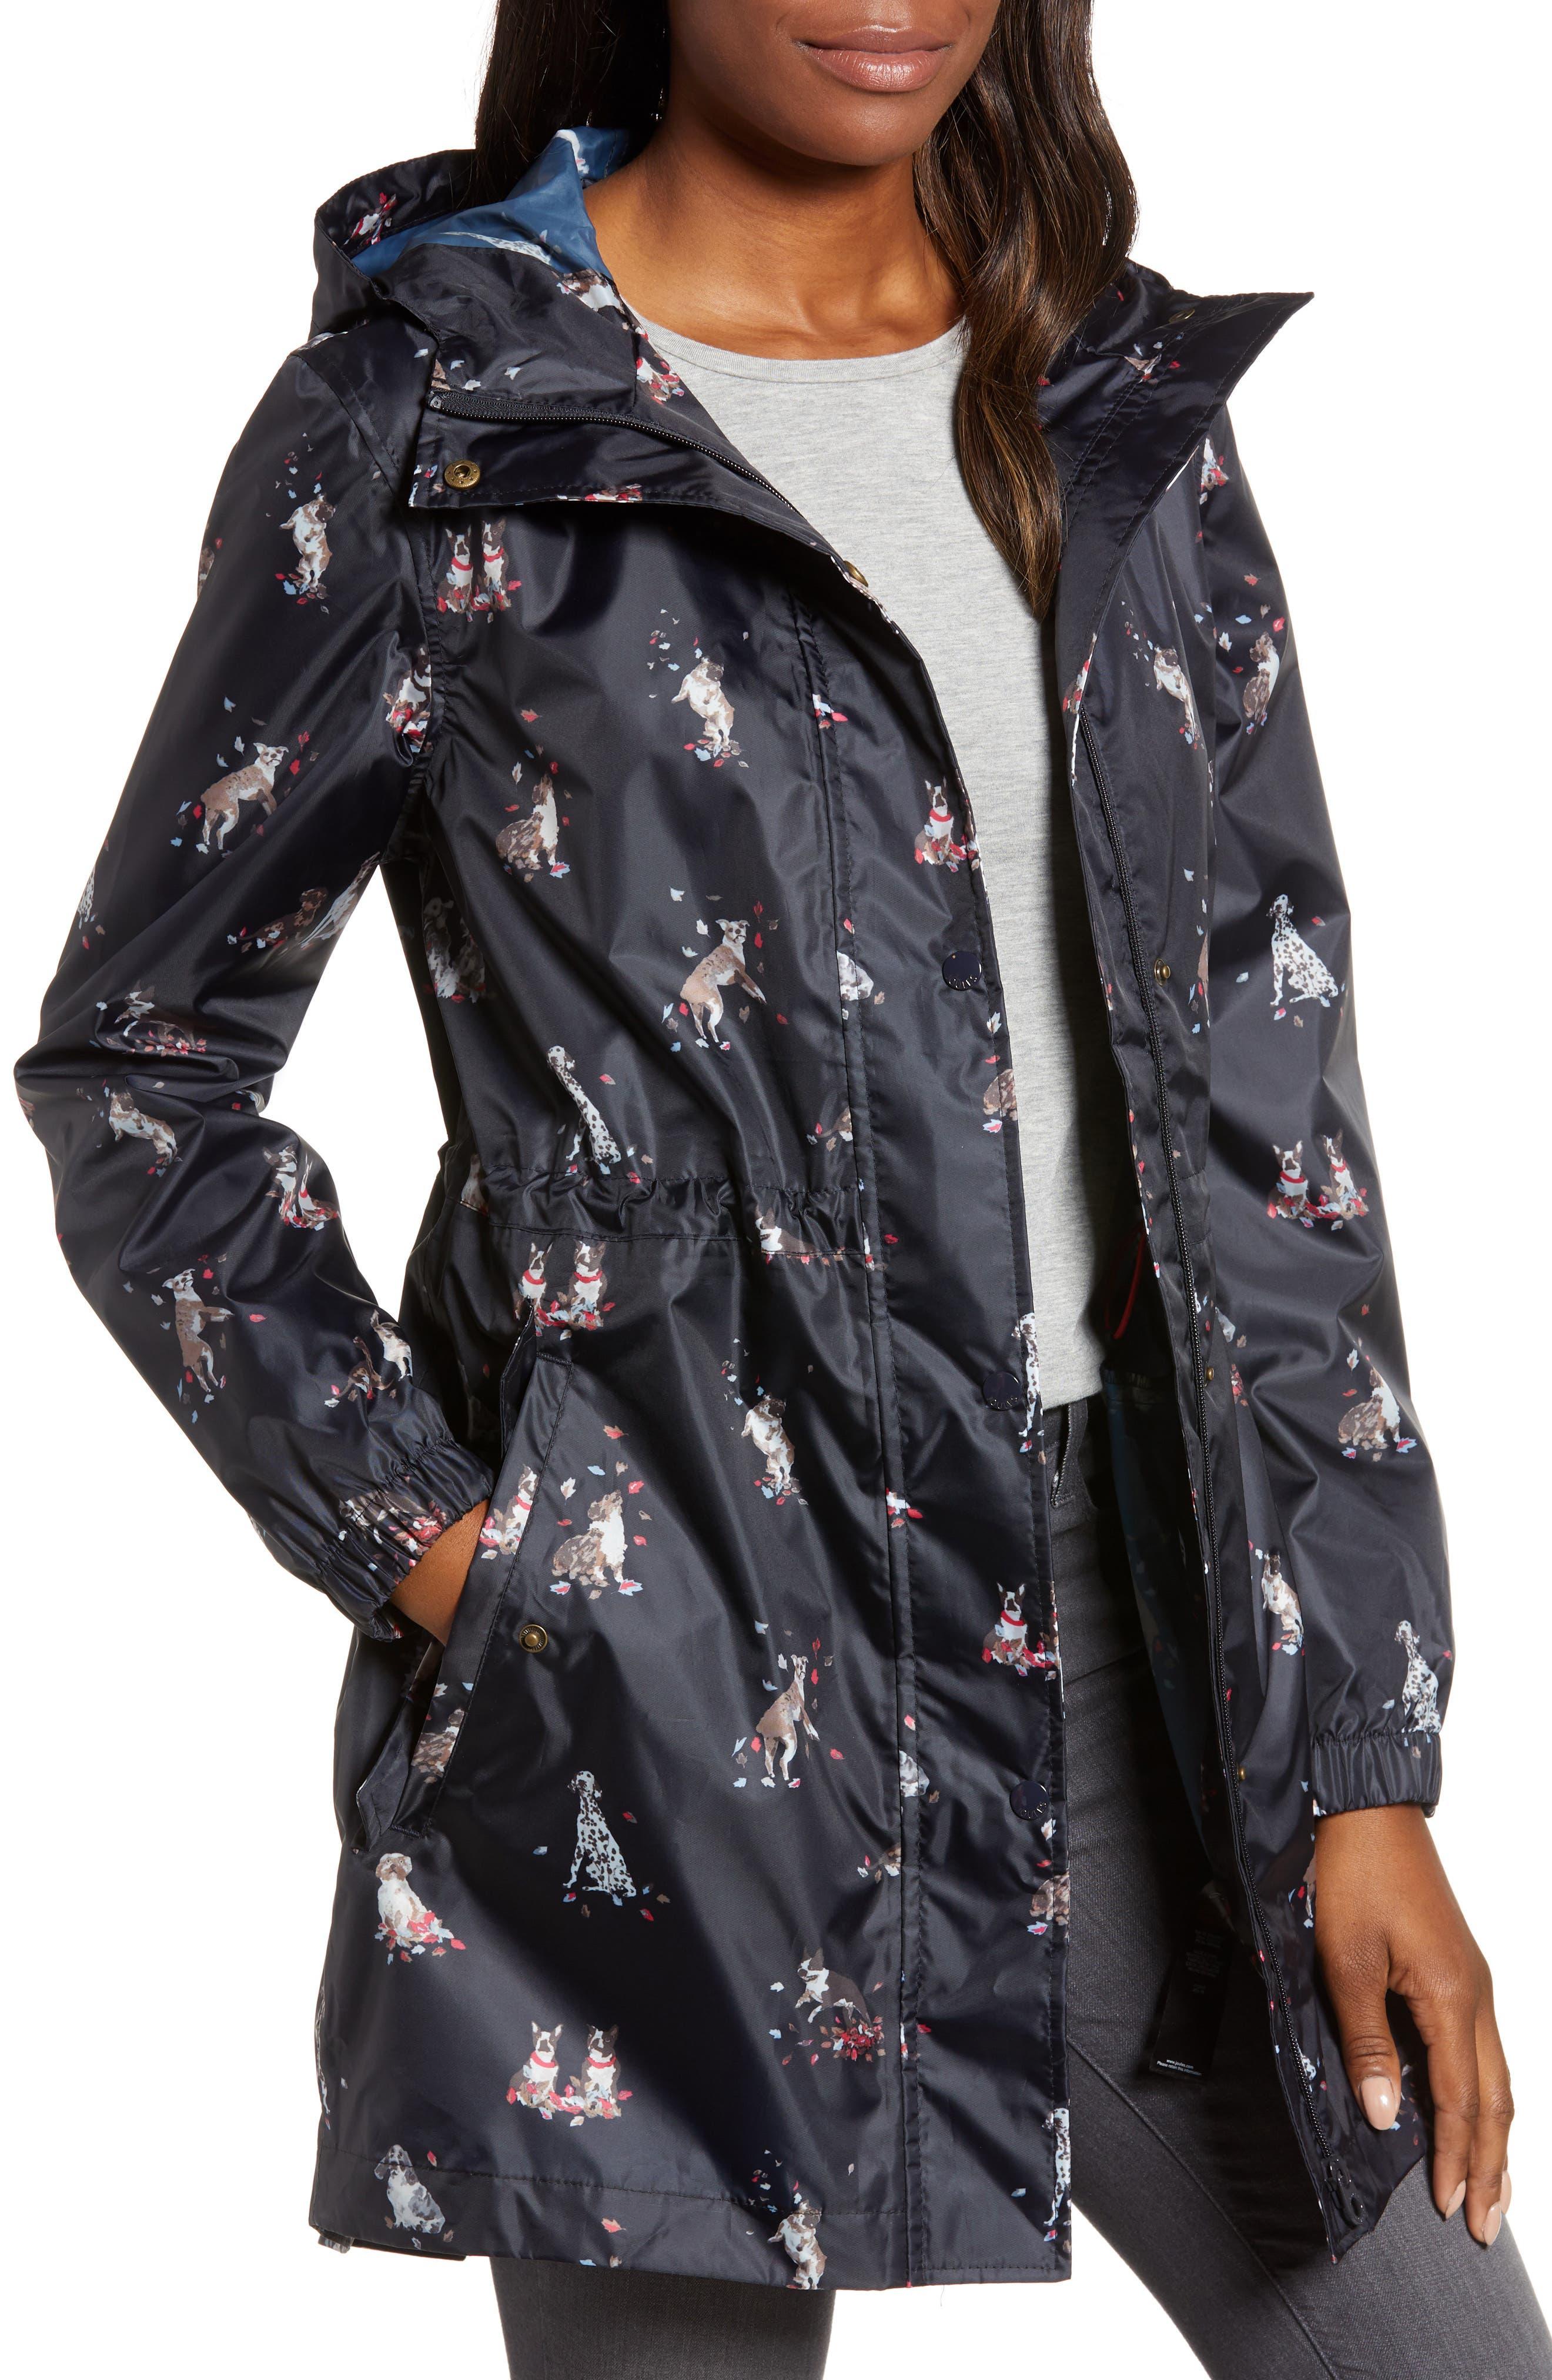 Right as Rain Packable Print Hooded Raincoat,                             Main thumbnail 1, color,                             410